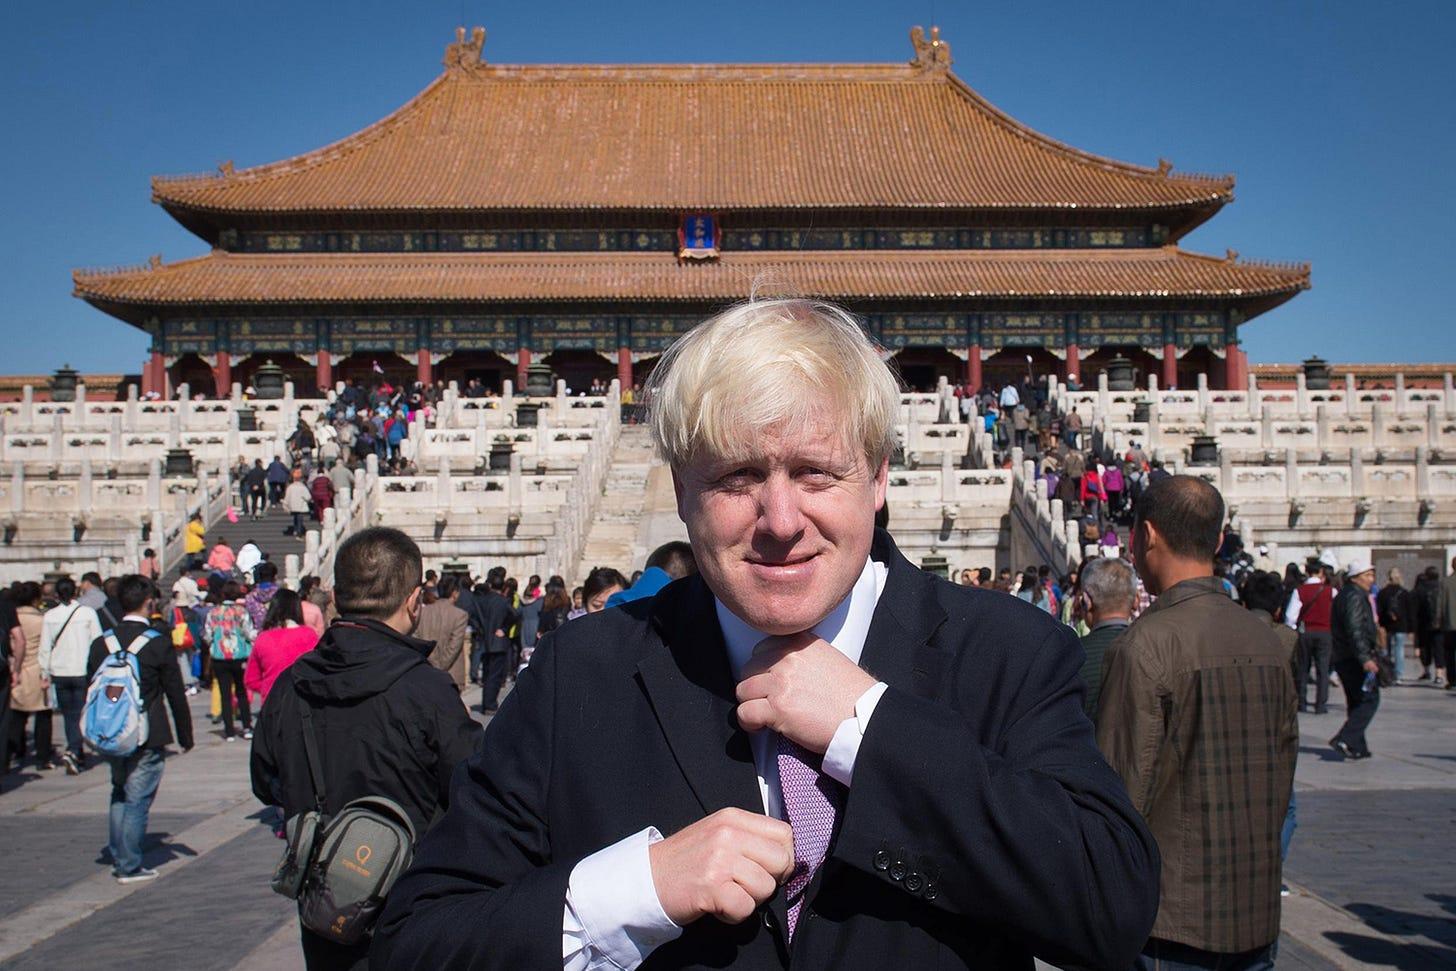 Boris Johnson's Remarkable U-Turn From Sinophile to China Hawk